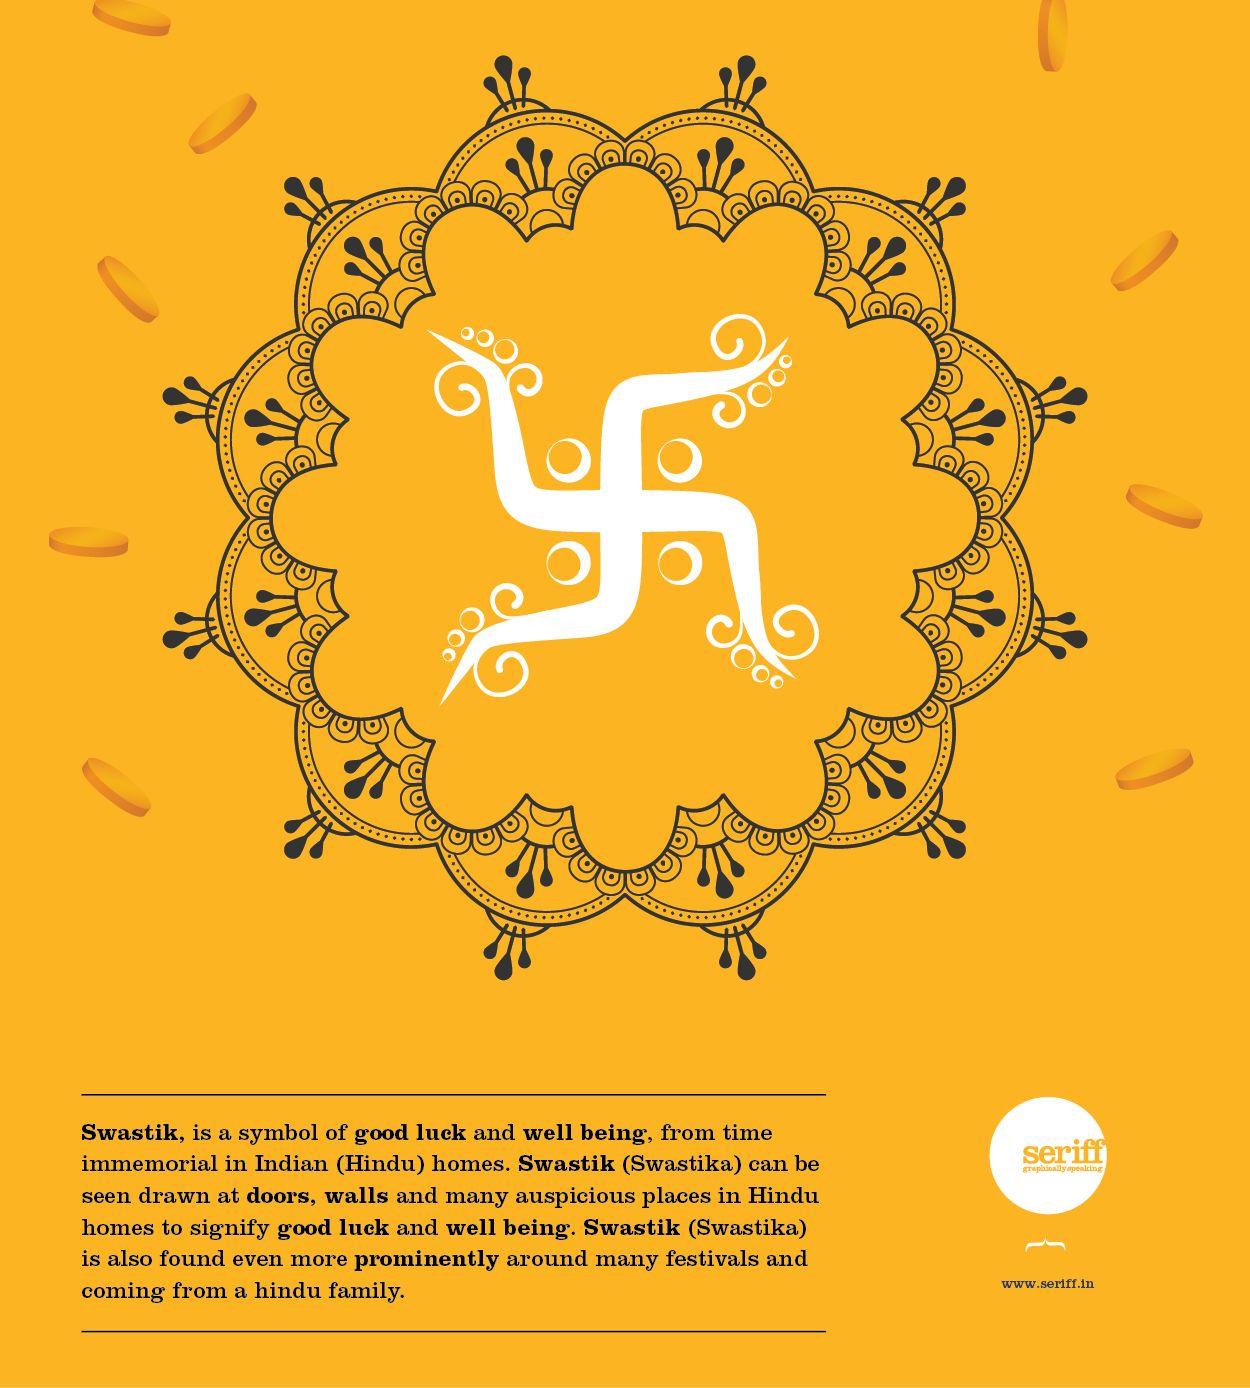 Swastik Swastik Symbol Goodluck Wellbeing Hindu Doors Walls